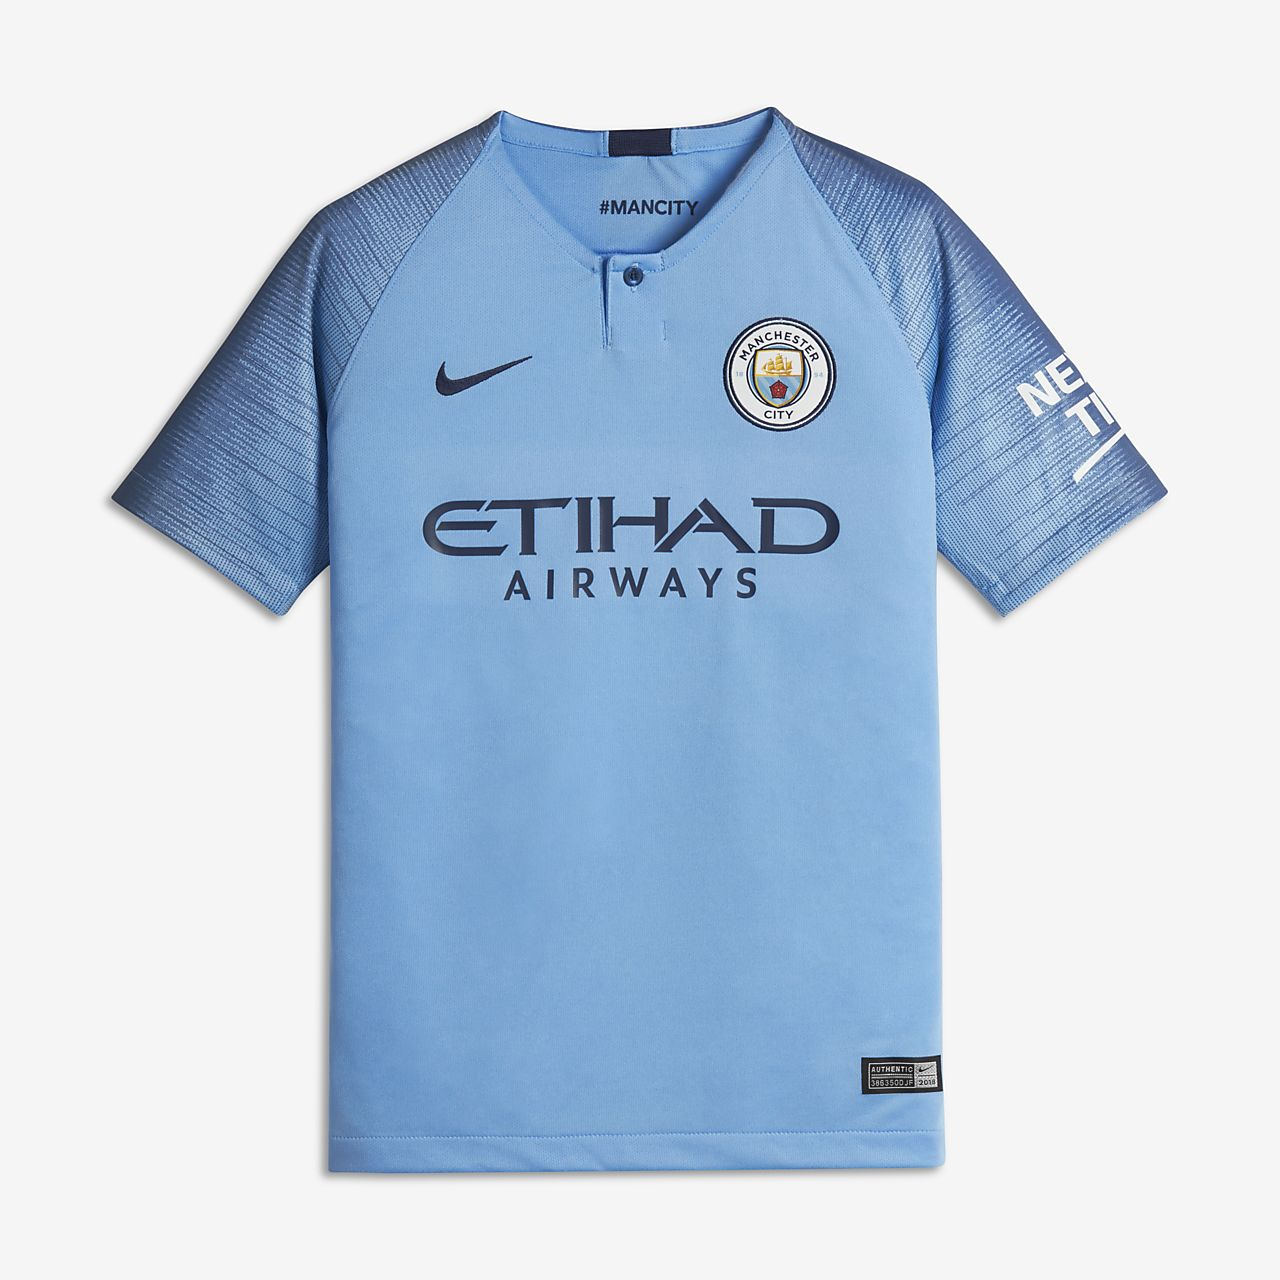 Camiseta de fútbol para niños talla grande de local Stadium del Manchester  City FC 2018  e688005b647b7